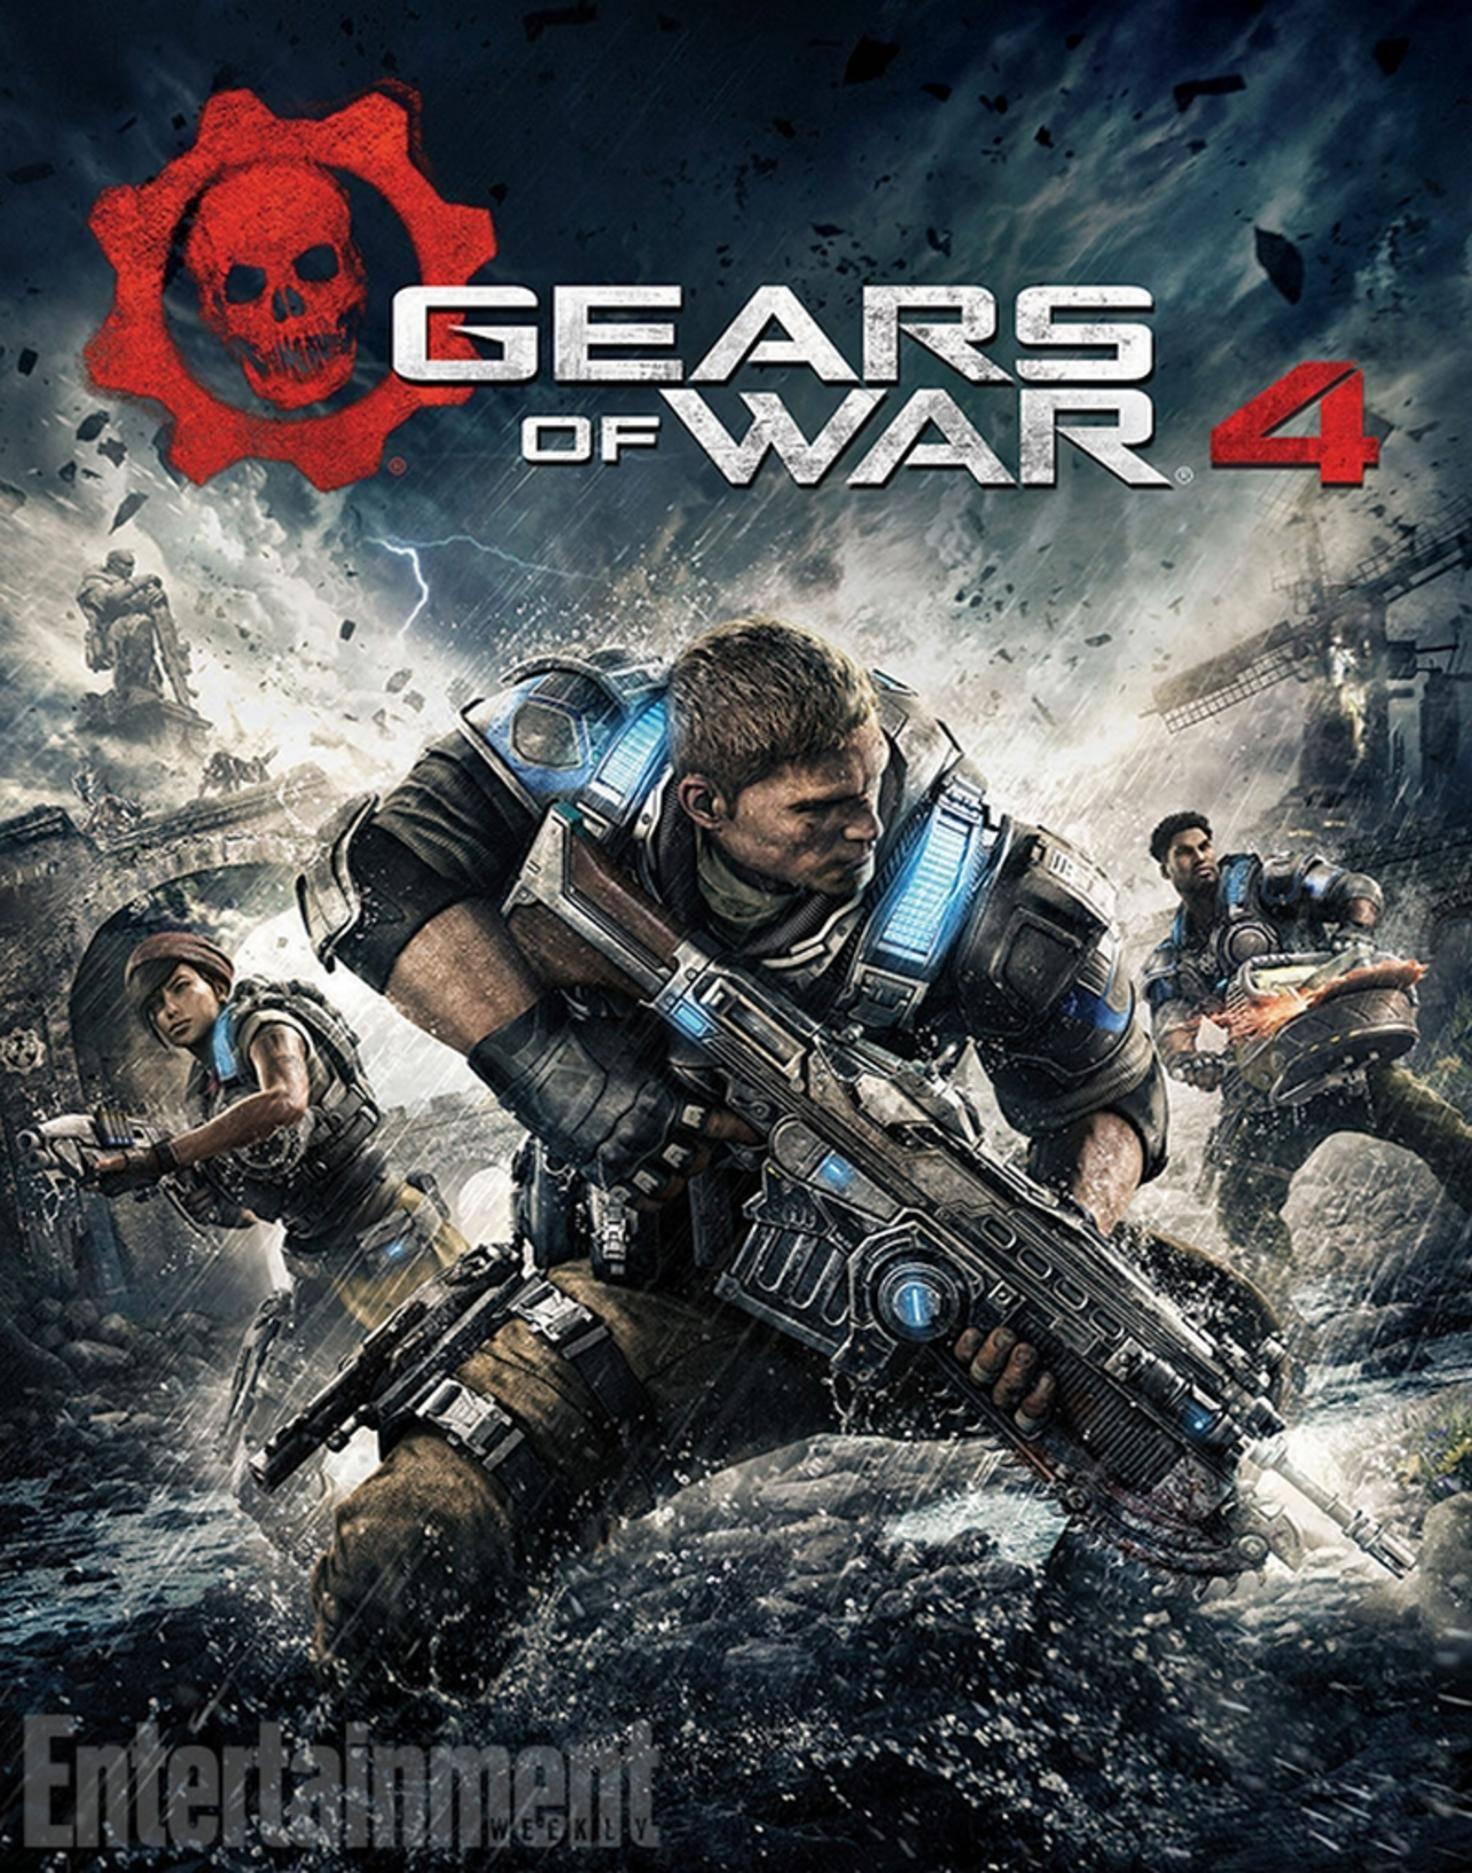 Gears_of_War4_Cover